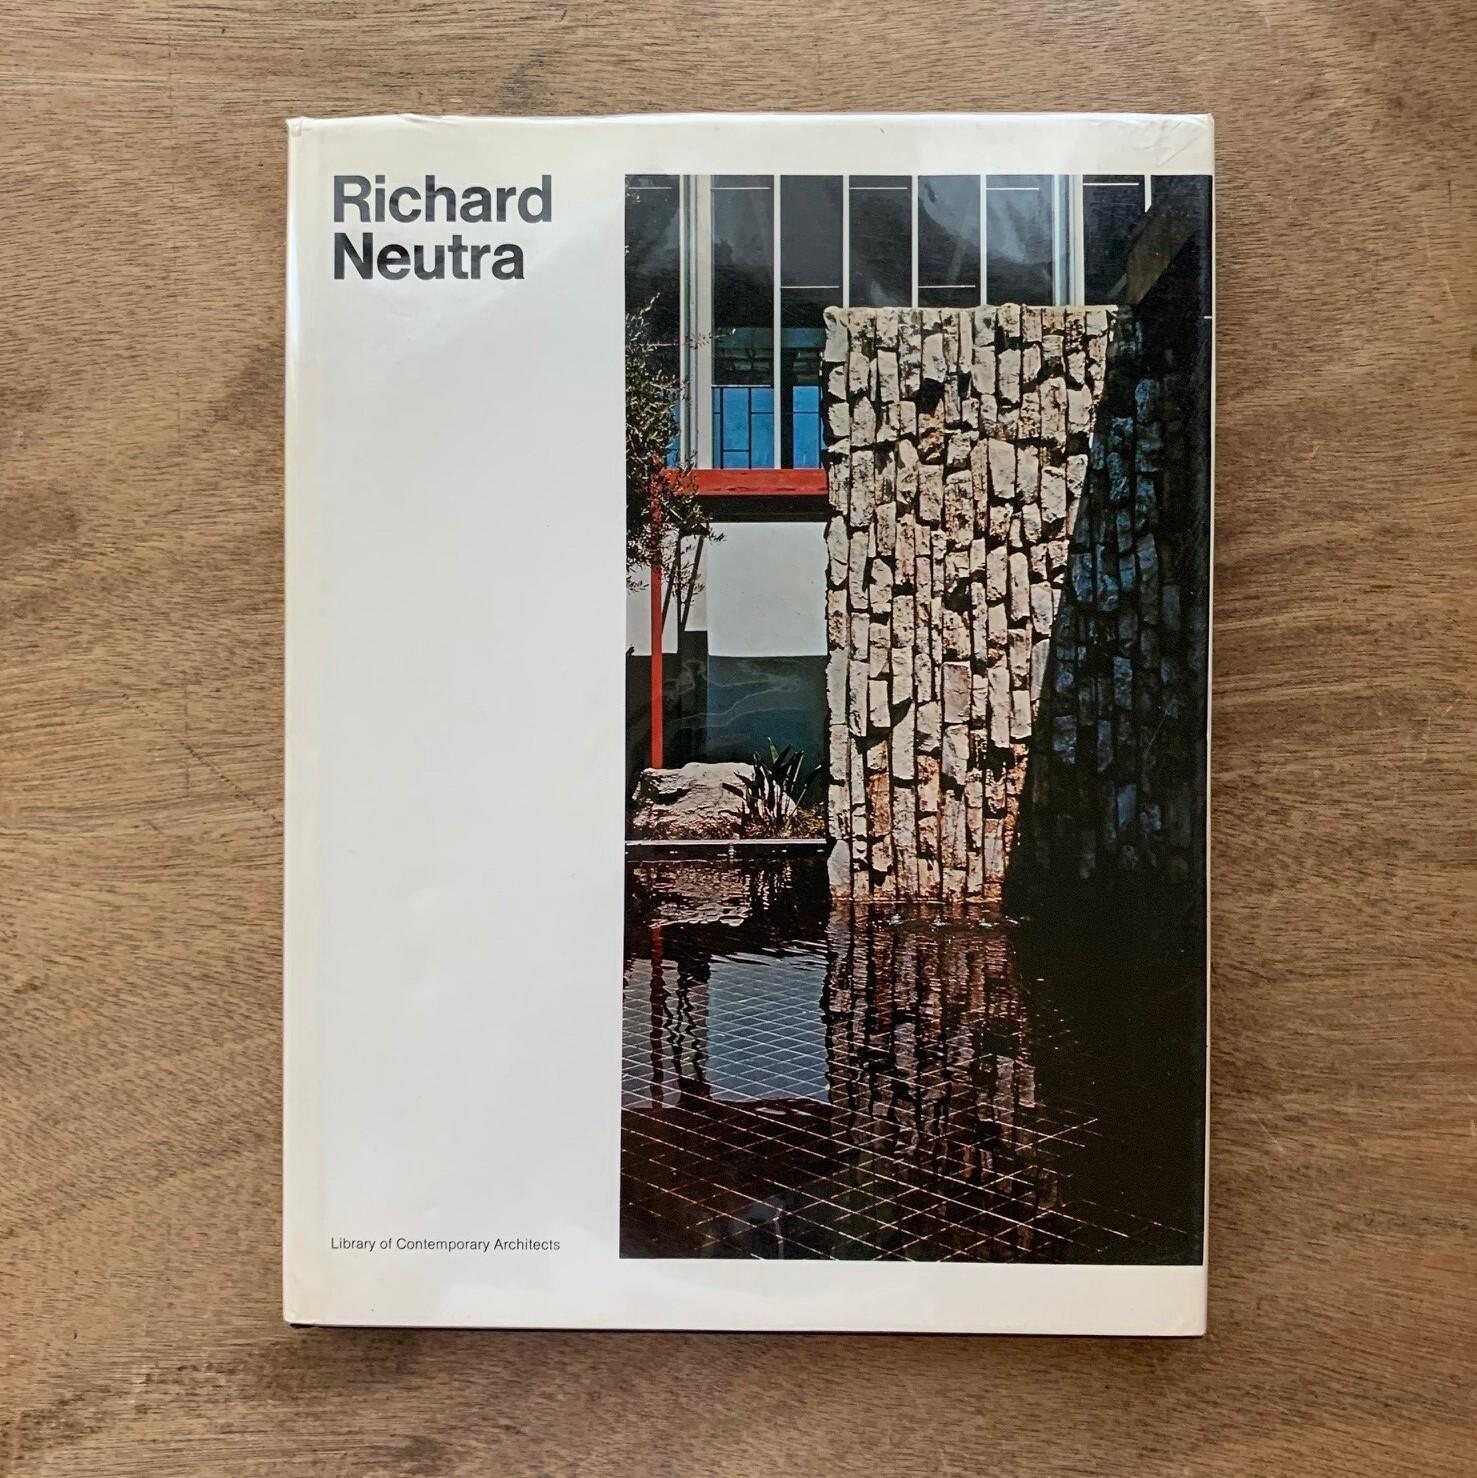 Richard Neutra リチャード・ニュートラ / 現代建築家シリーズ /